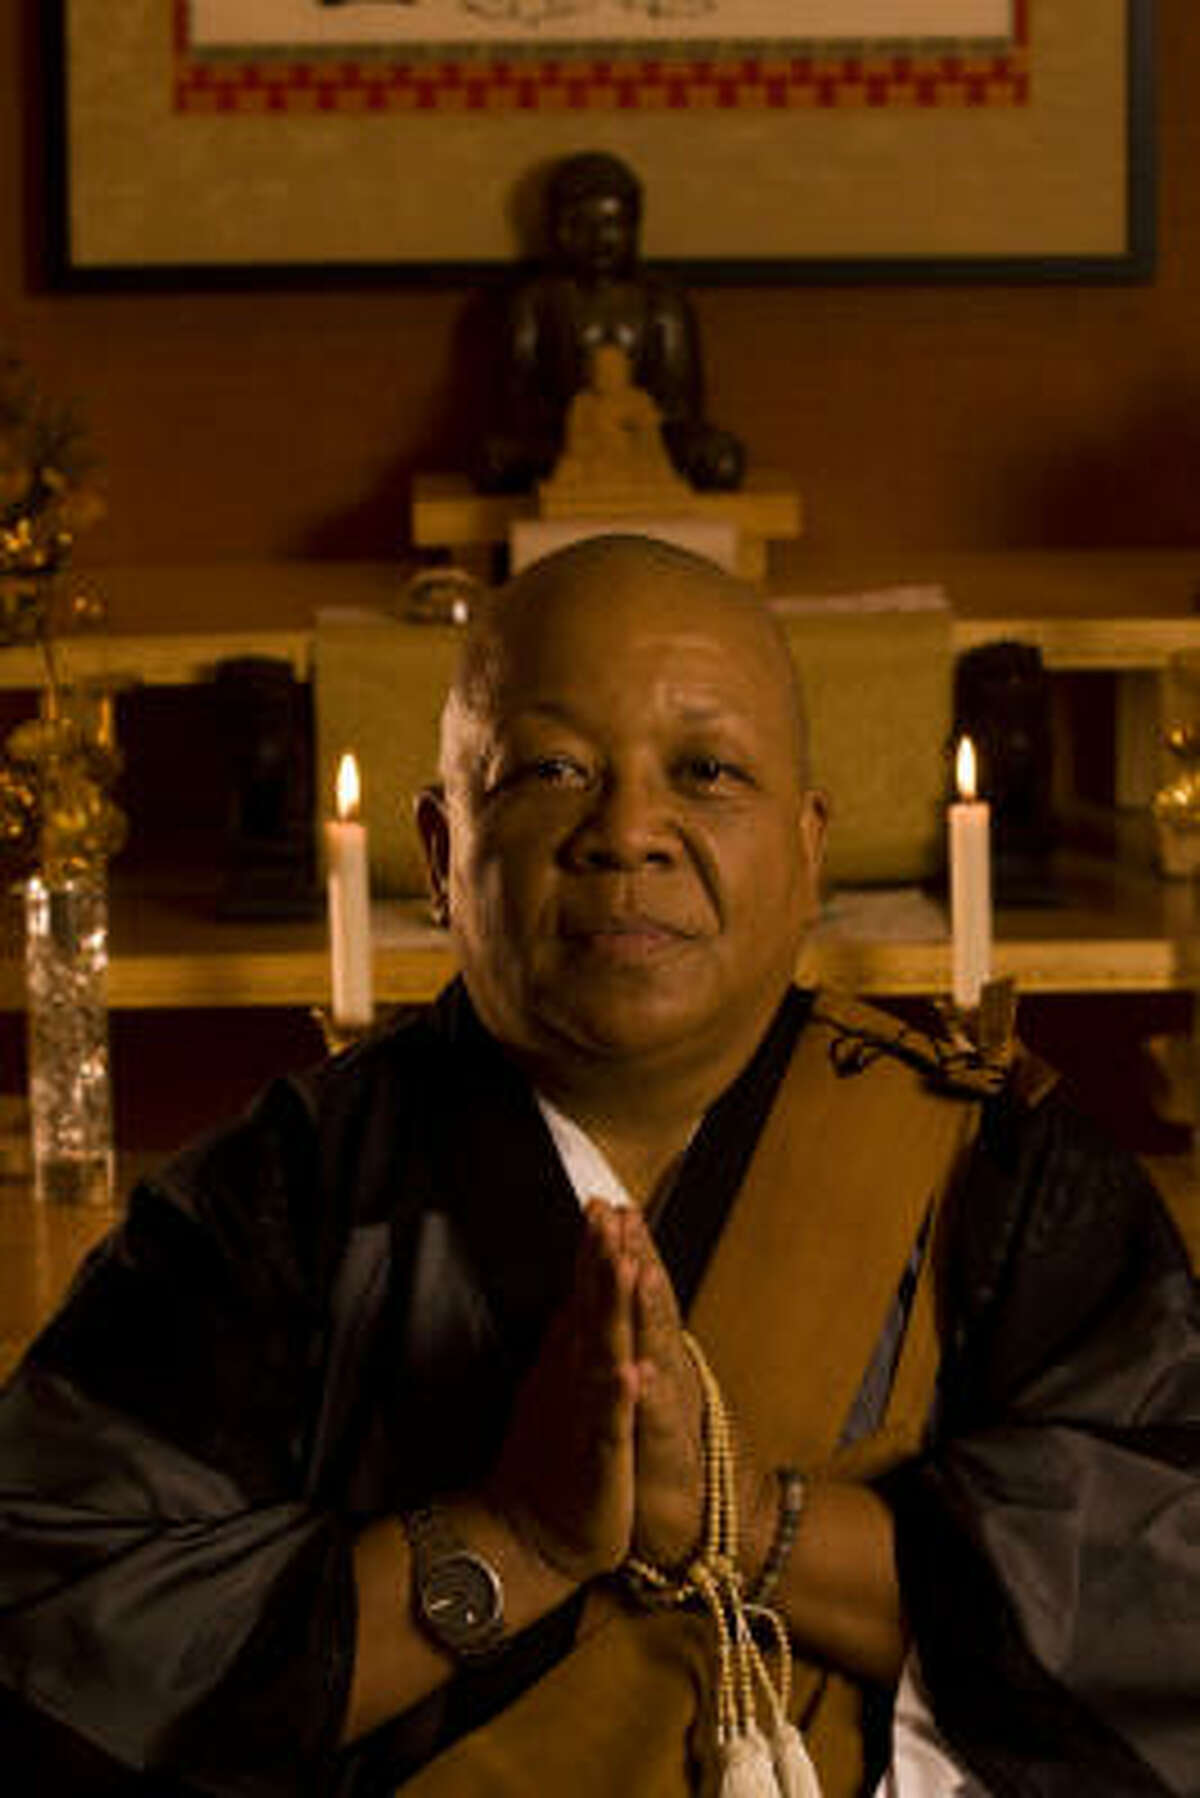 Rev. Myokei Caine-Barrett is the only woman in North America to lead a Nichiren Shu Buddhist congregation.